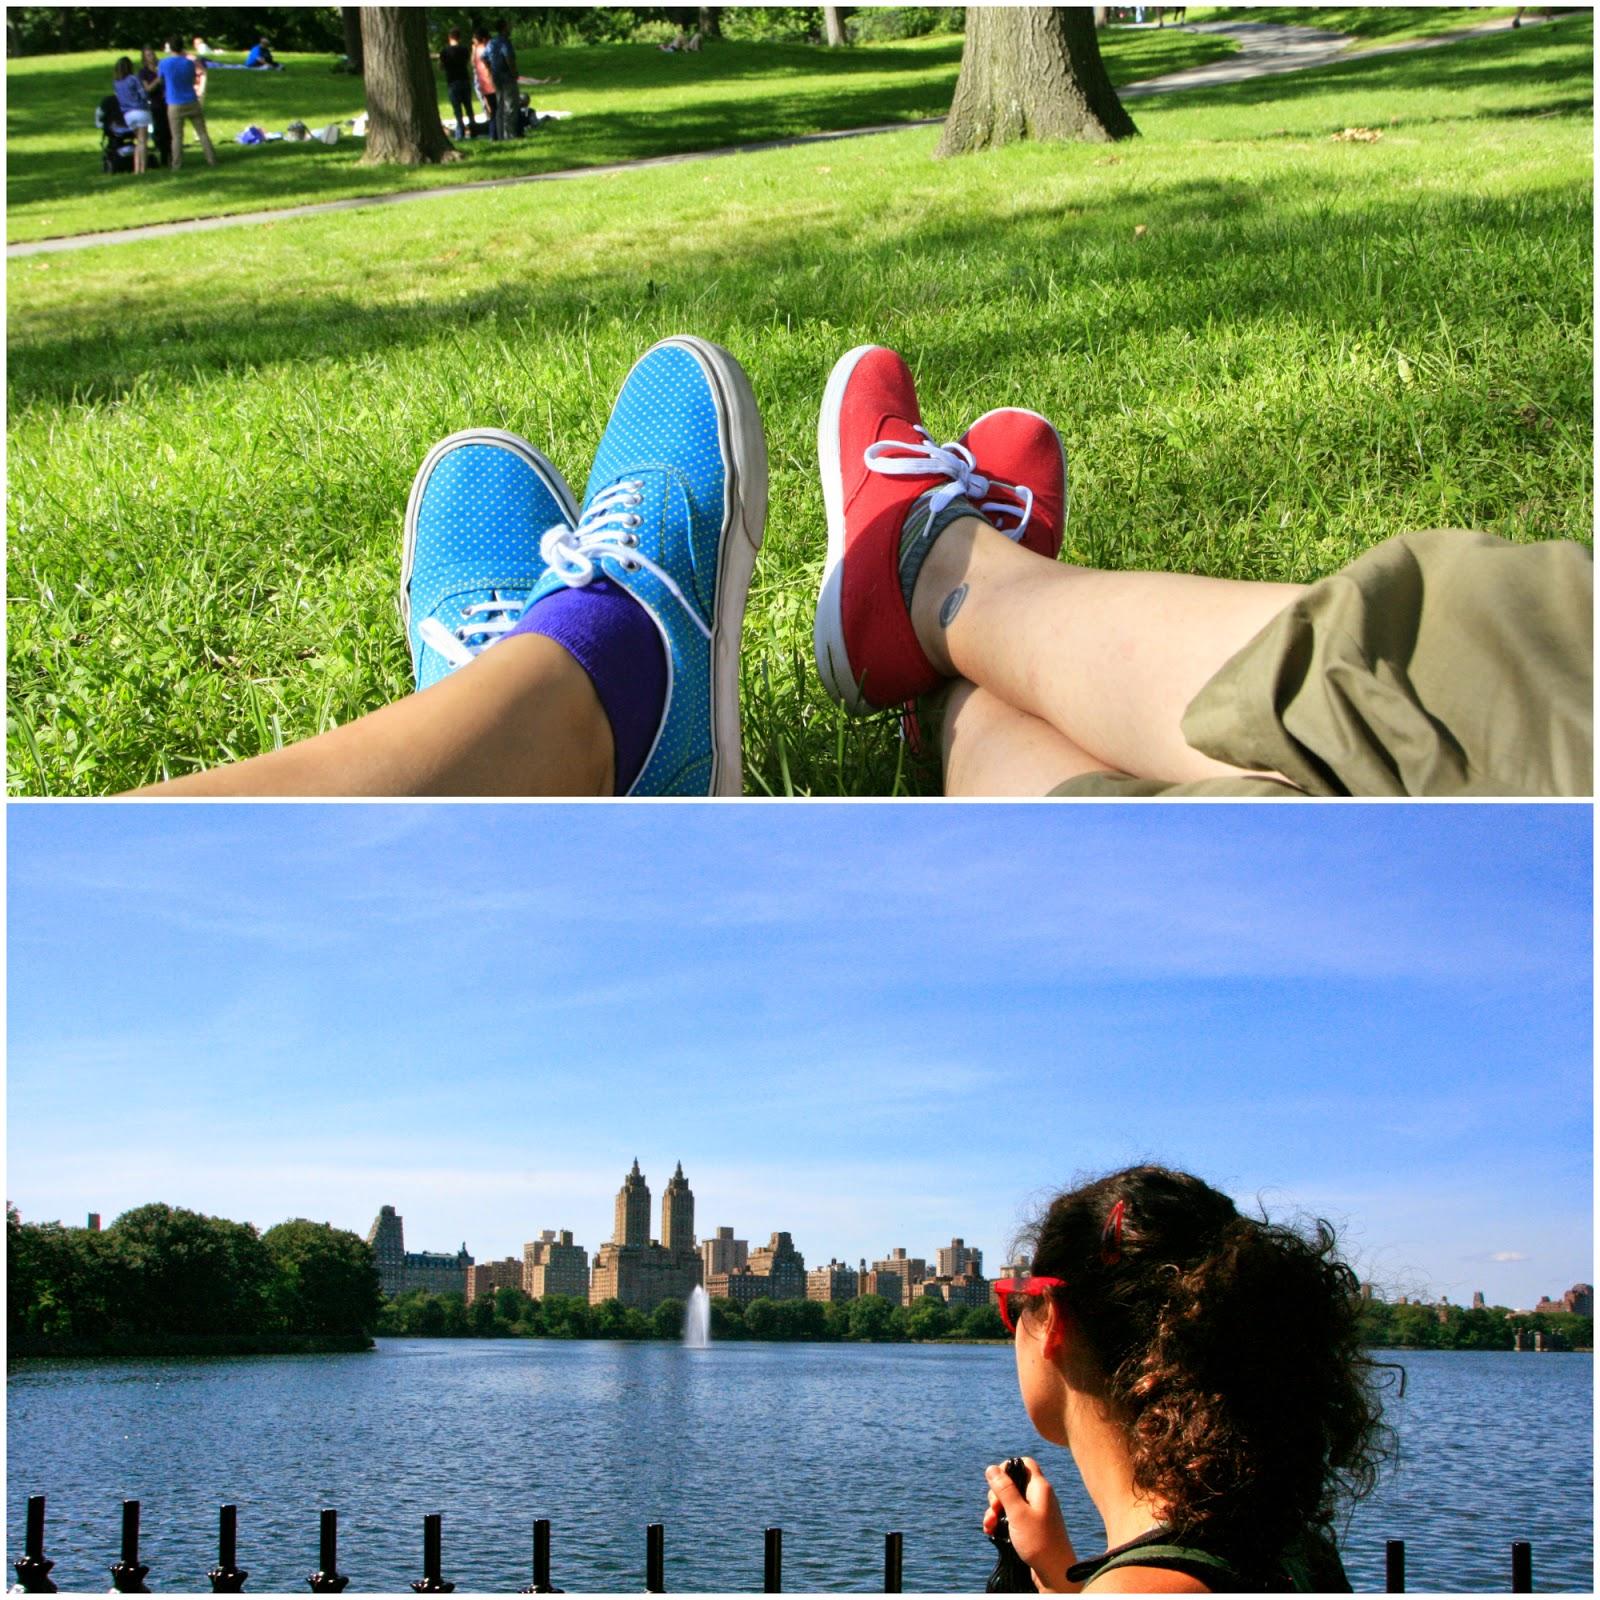 Descansant a Central Park, Nova York